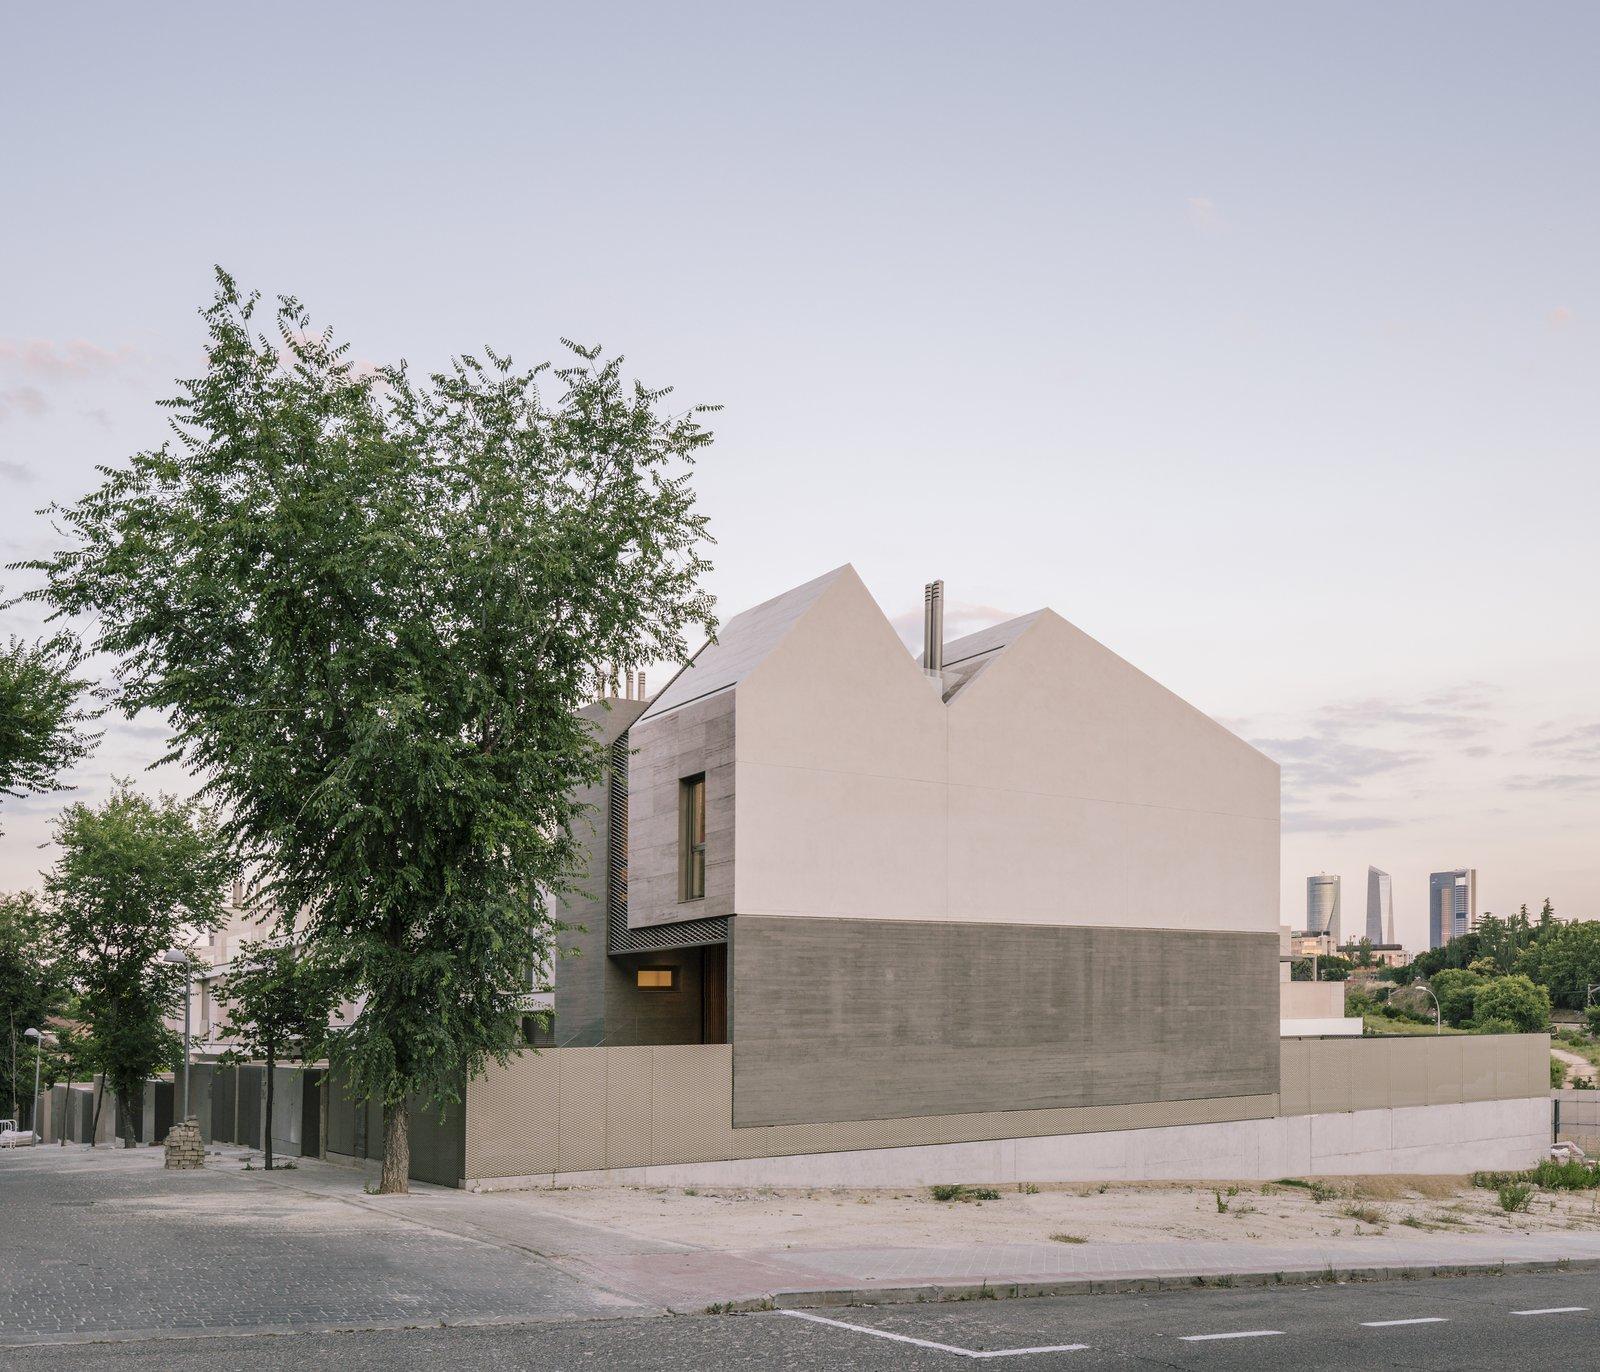 Sierra House exterior